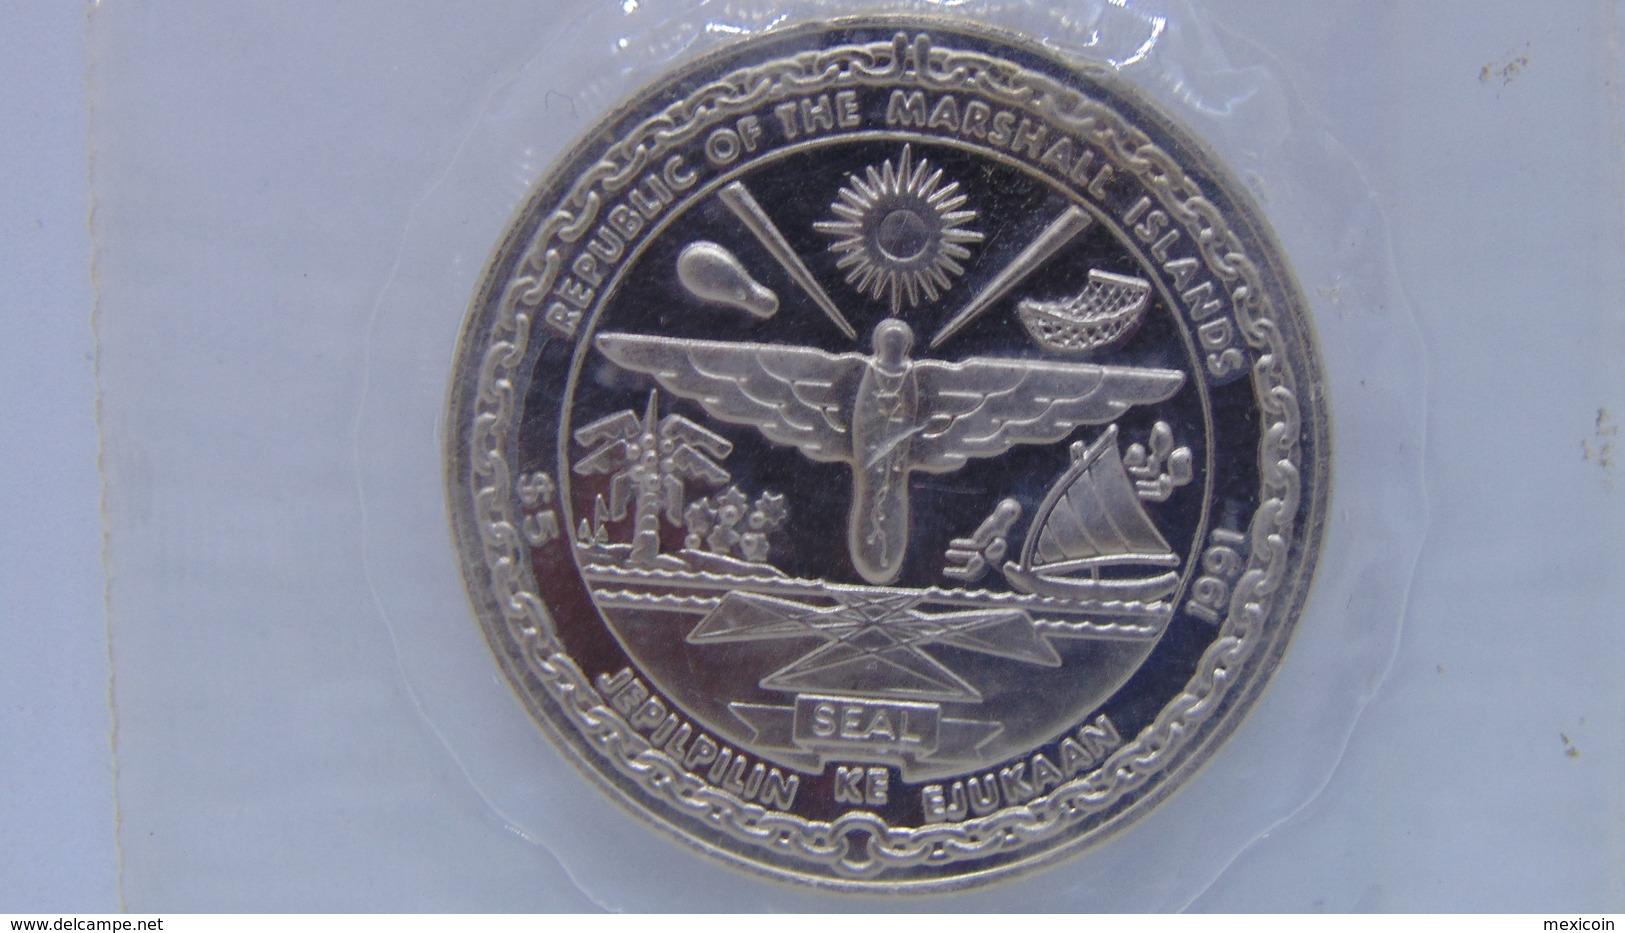 Marshall Islands 5 Dollars BU Crown Size Coins 1991 Shuttle Columbia - Micronesia